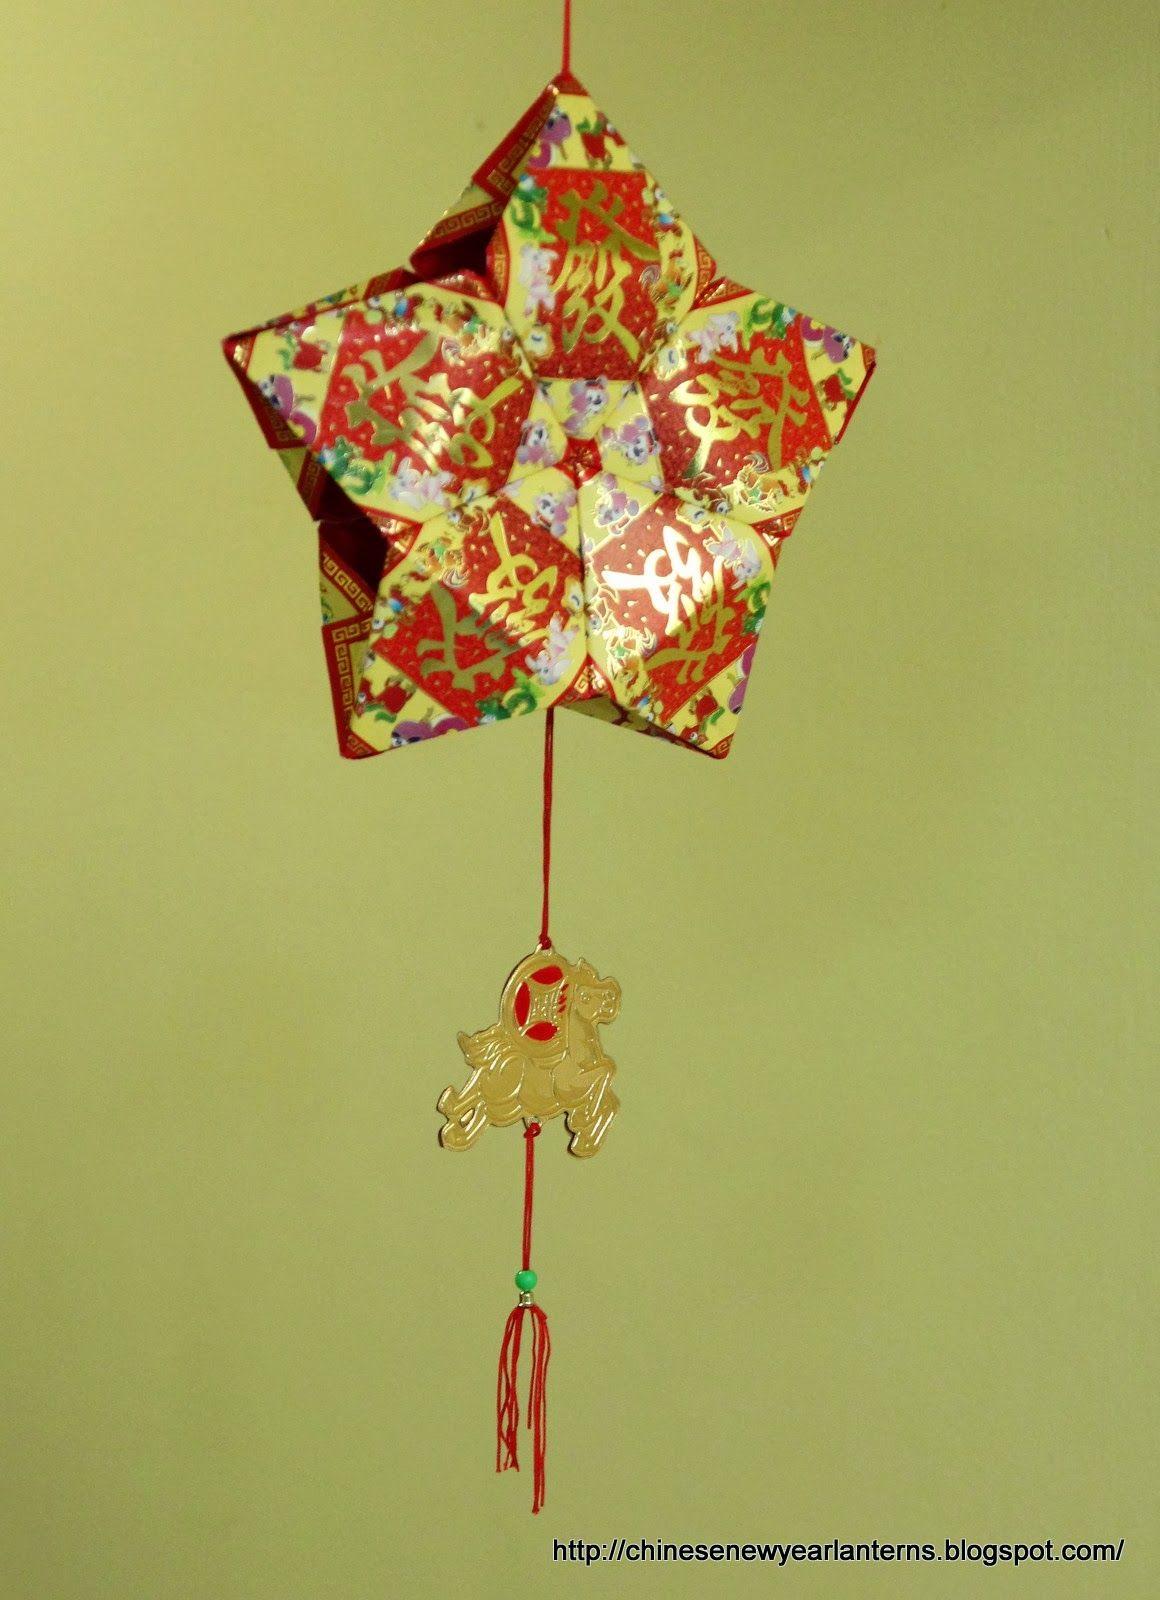 Chinese New Year Lanterns 红包灯笼手工制作: How to make an Lucky ...